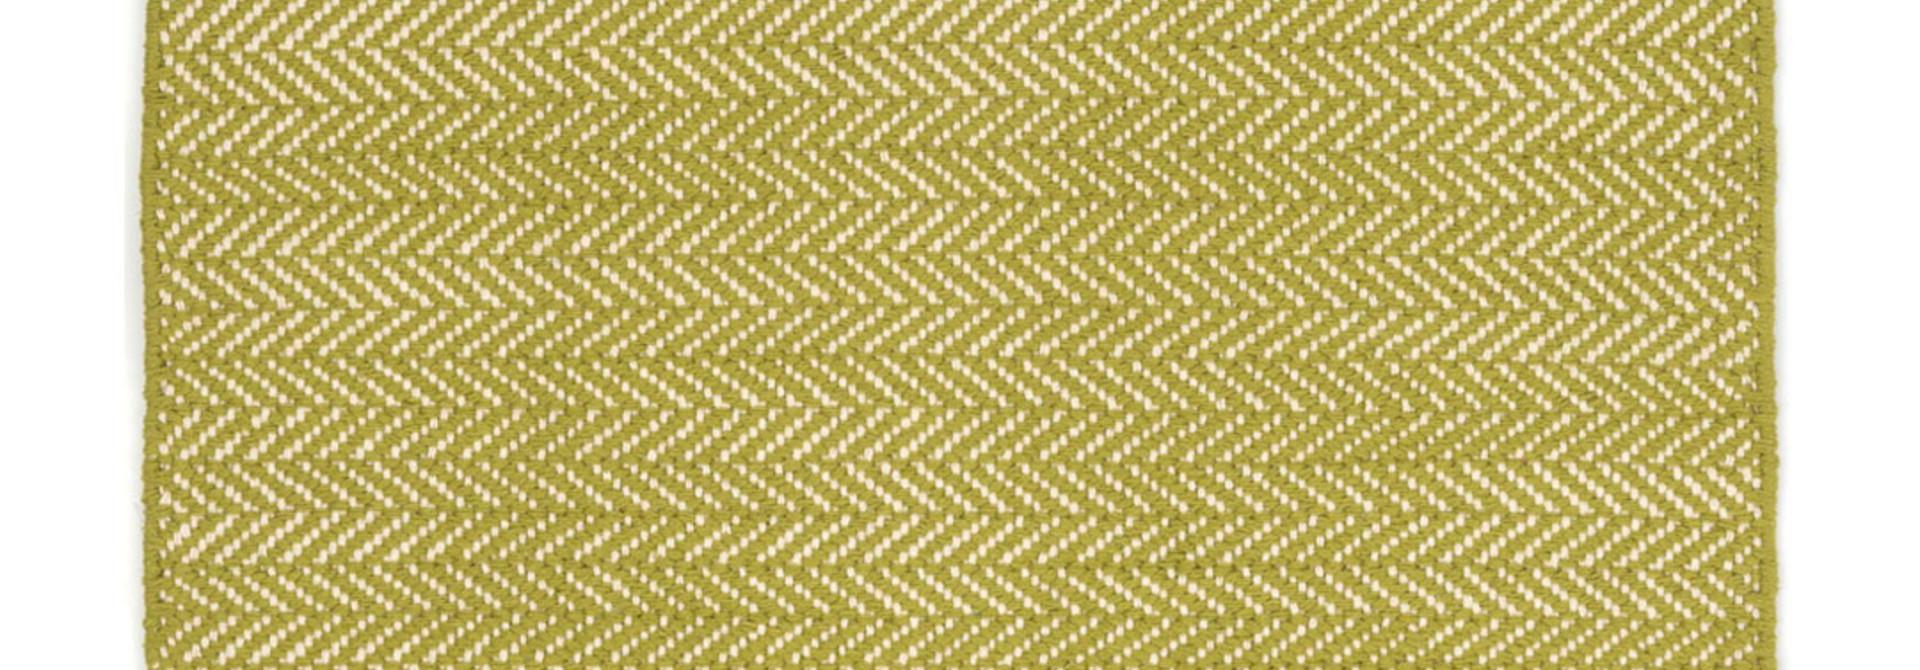 Herringbone Citrus Woven Cotton Rug